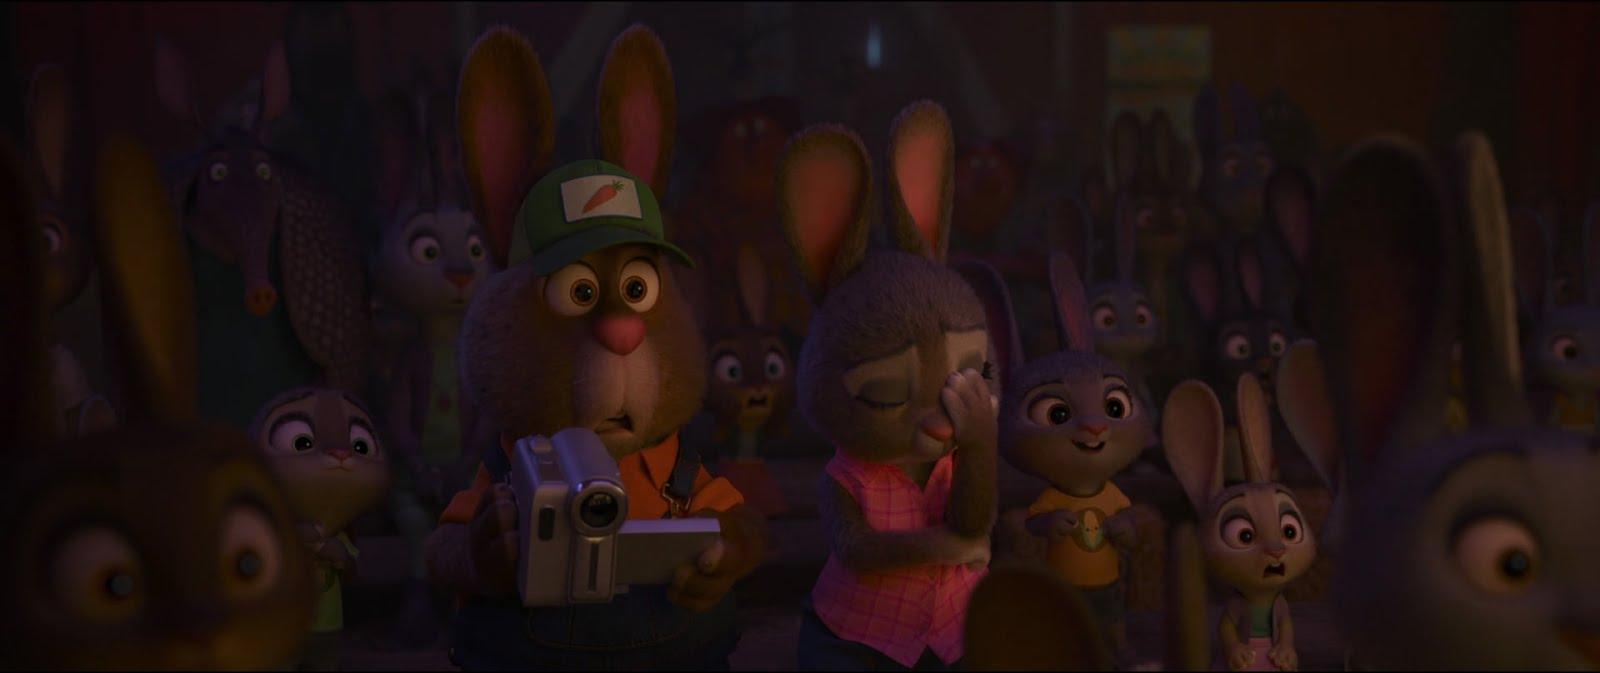 FreezeFrame #1- Rabbit Reactions! - Zootopia News Network